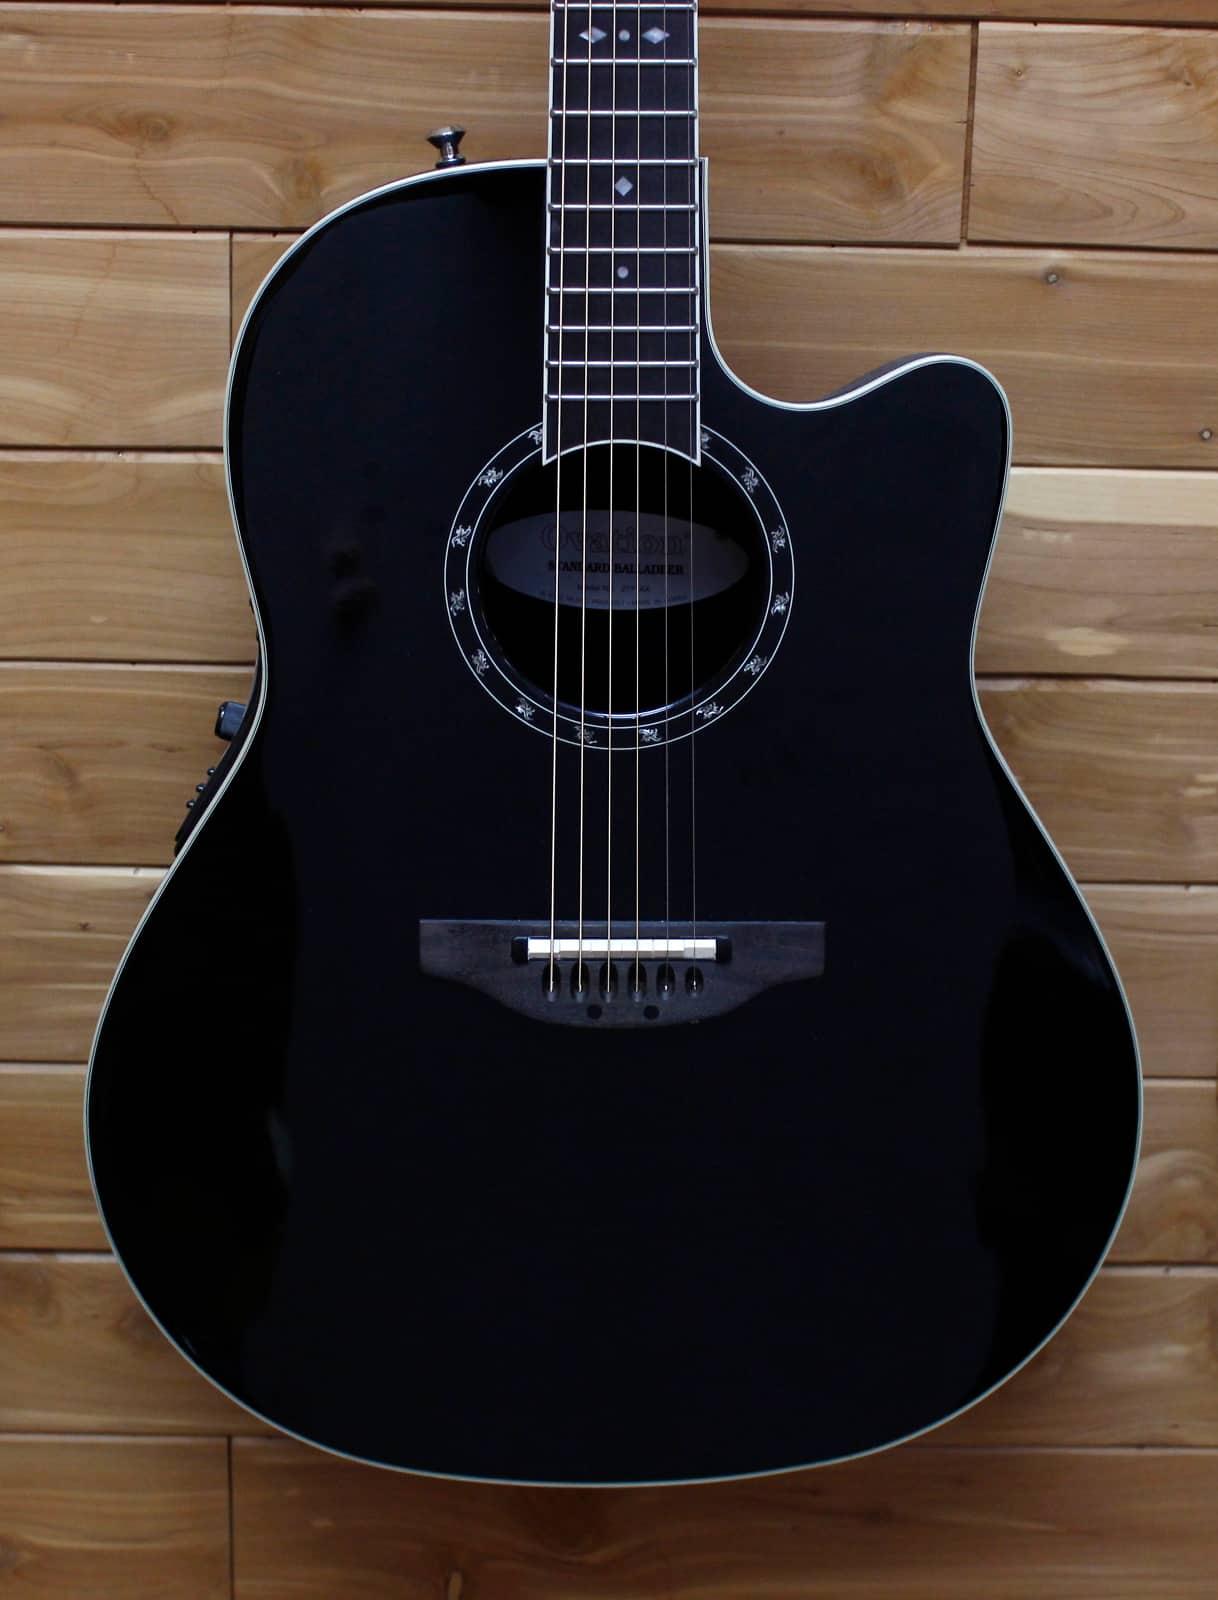 ovation standard balladeer 2771 ax acoustic electric guitar reverb. Black Bedroom Furniture Sets. Home Design Ideas